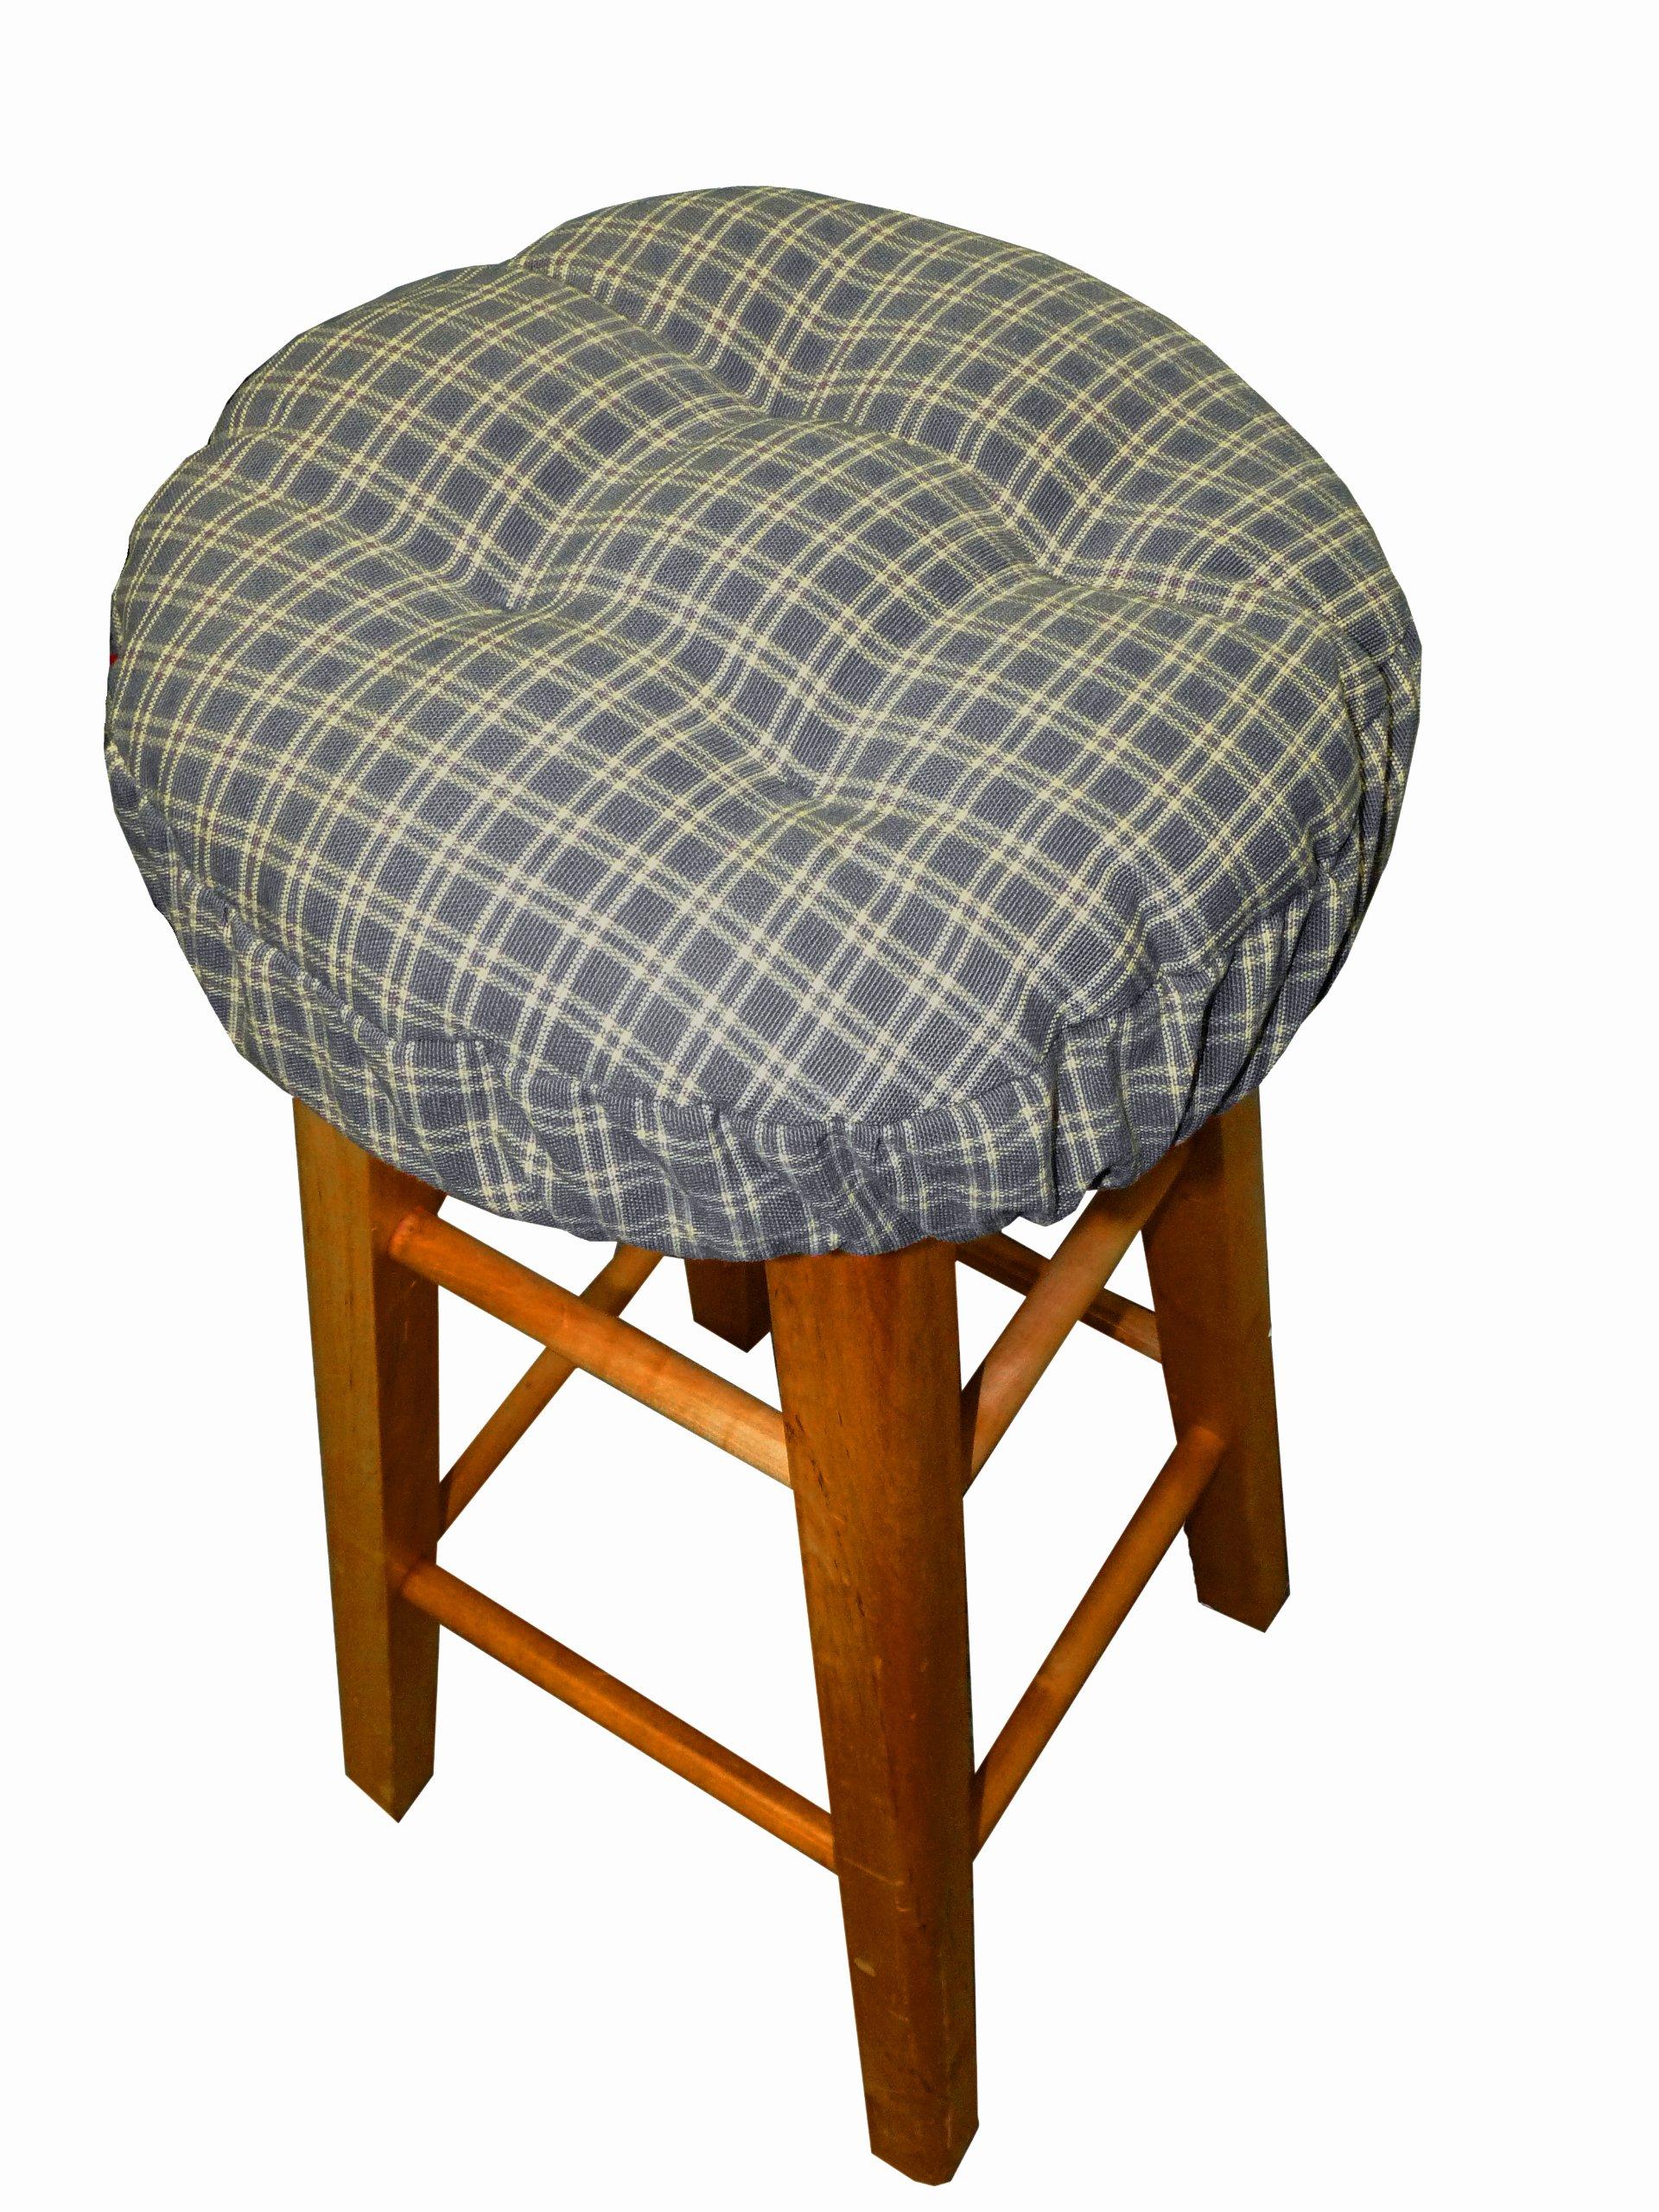 Britt Blue Plaid - Round Barstool Cushion with Drawstring Yoke - Size Extra-Large - Latex Foam Fill Bar Stool Pad (Slate, Windowpane)